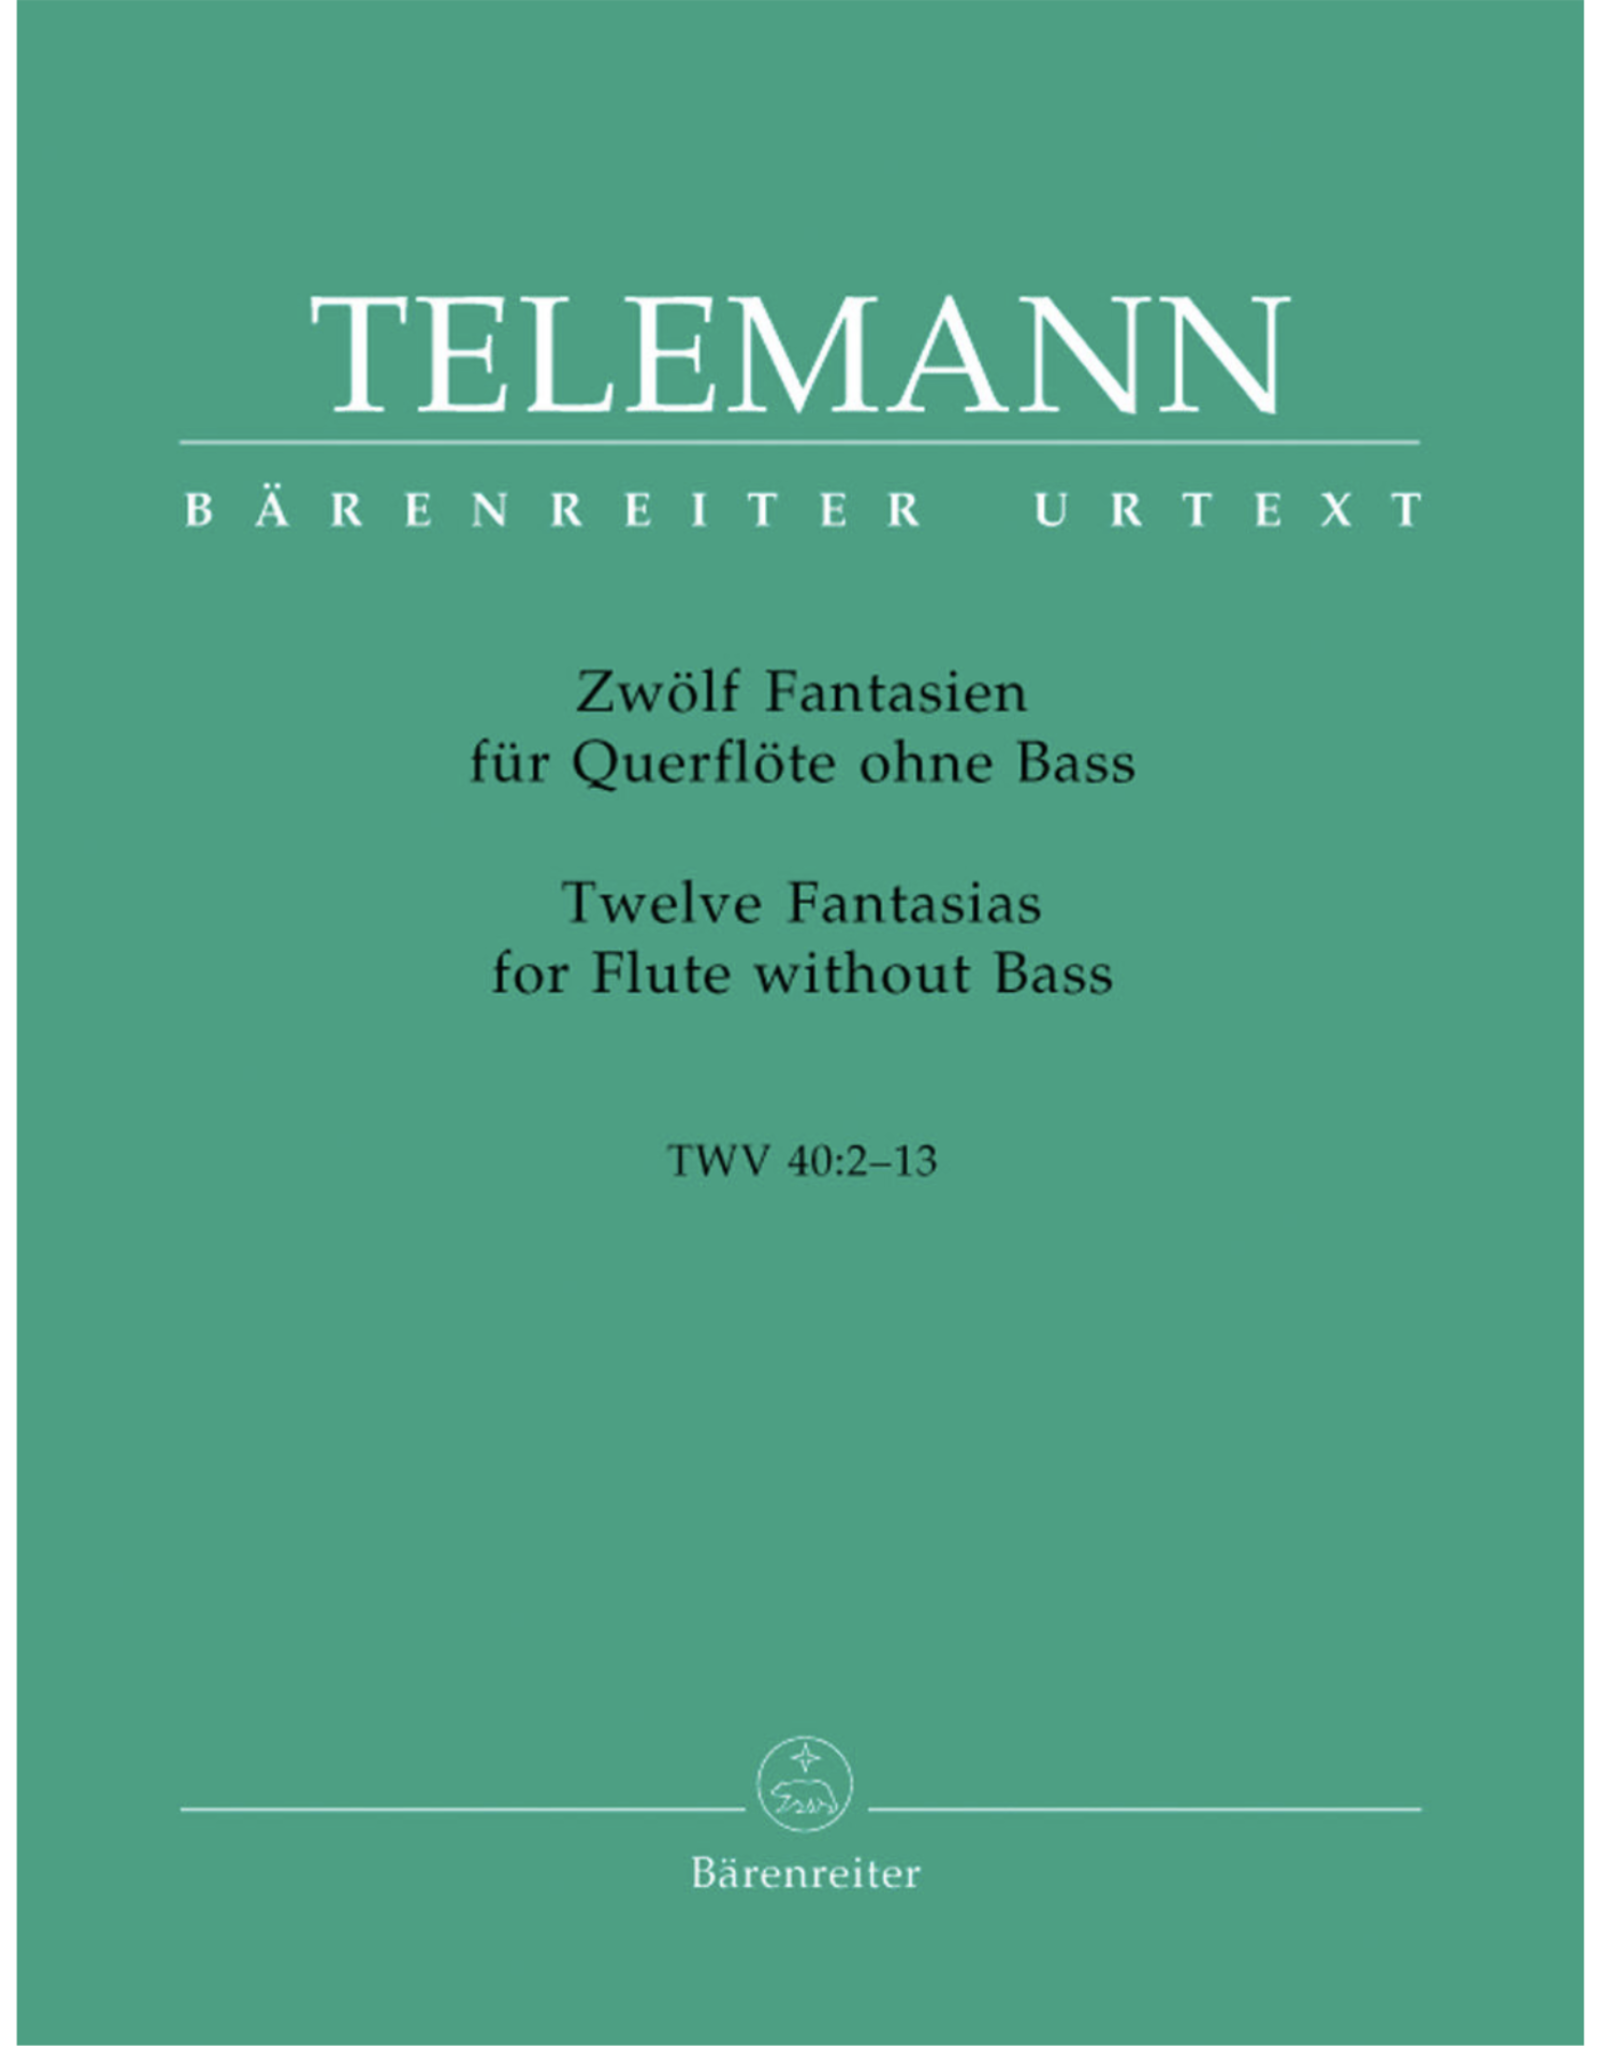 Barenreiter Twelve Fantasias for Flute without Bass TWV 40:2-13 - Telemann, Georg Philipp